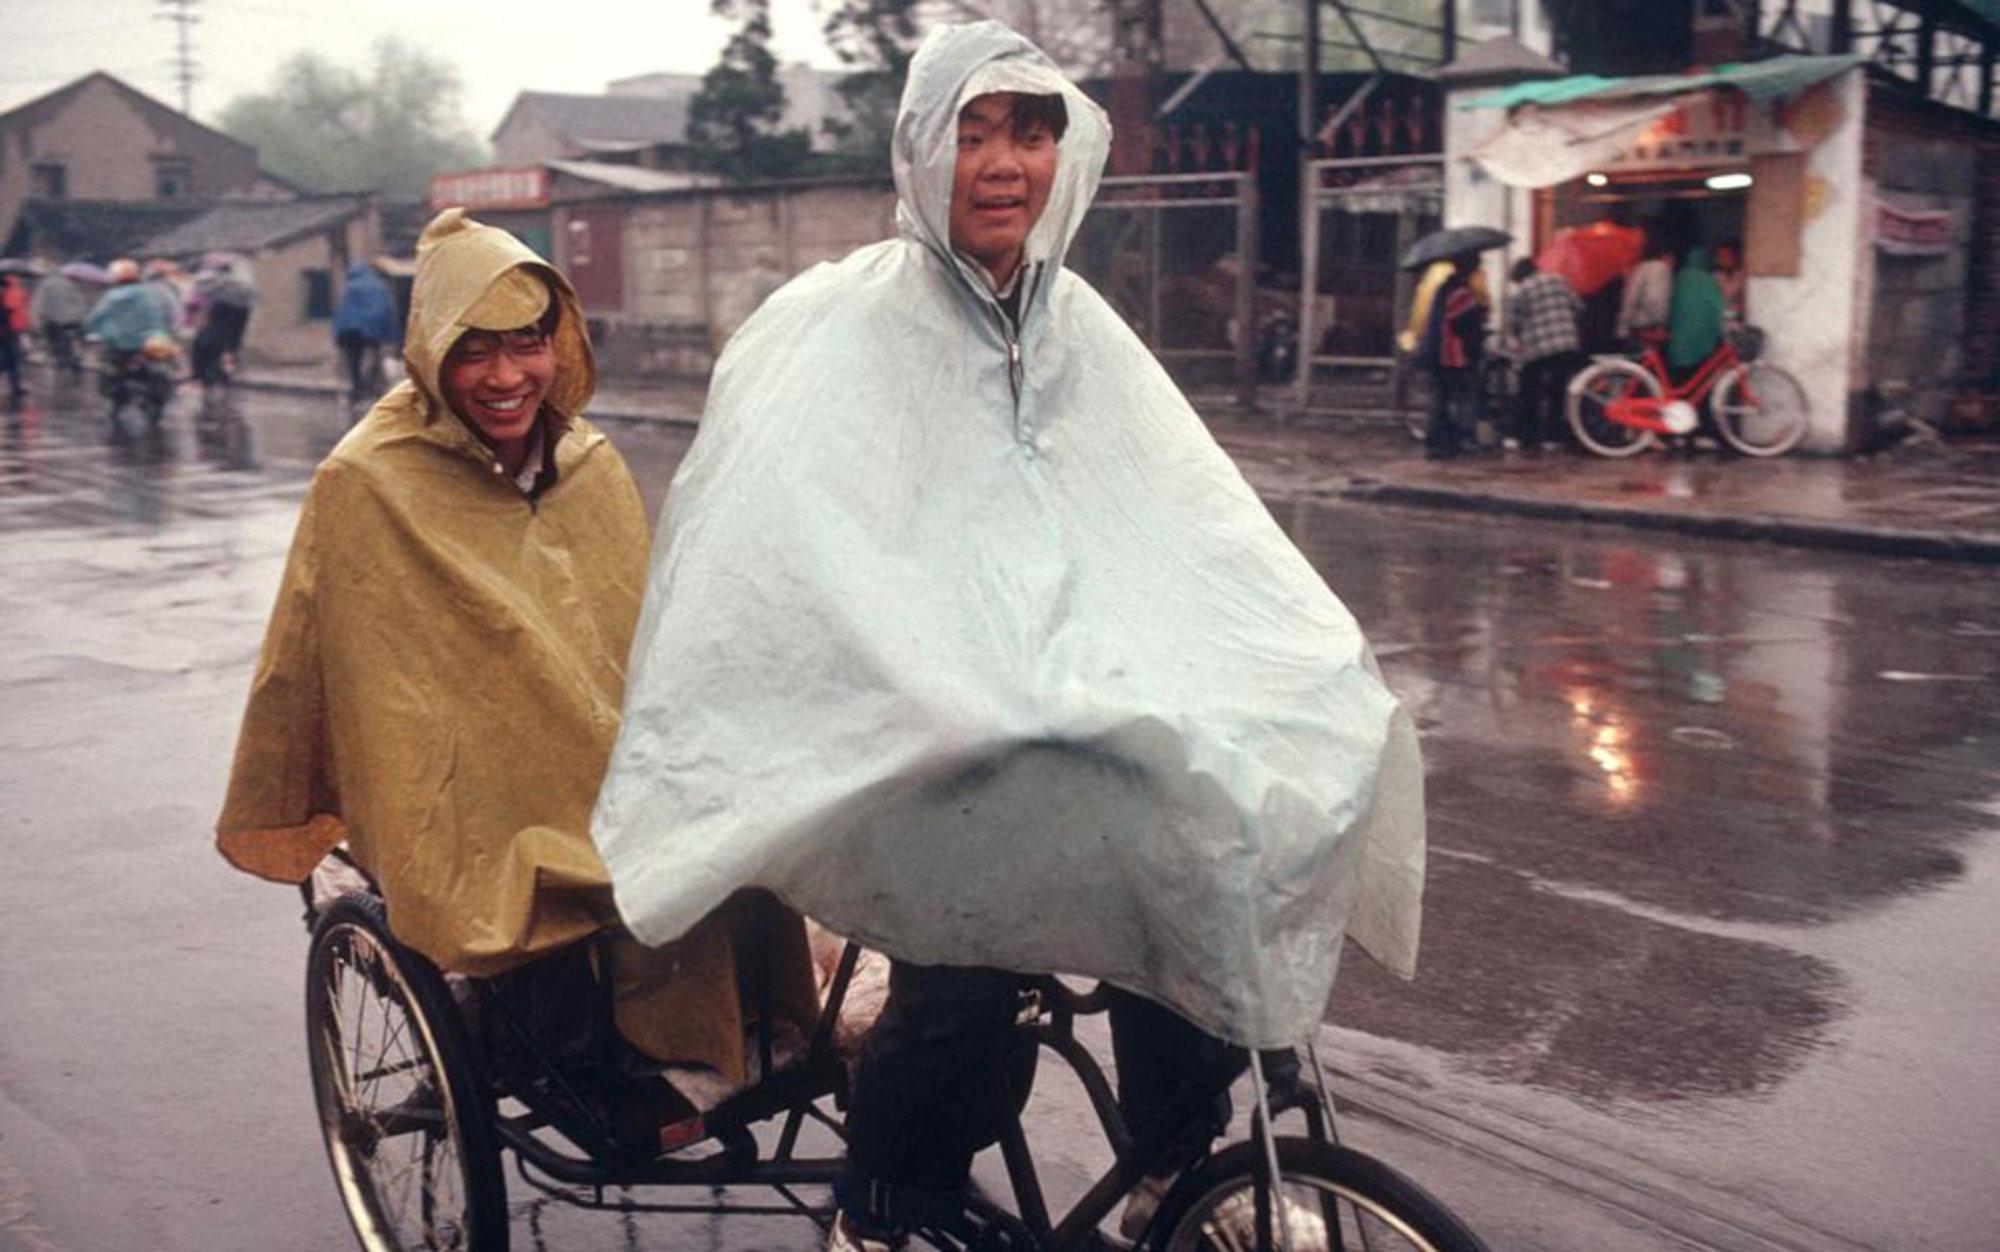 Header smiling in the rain